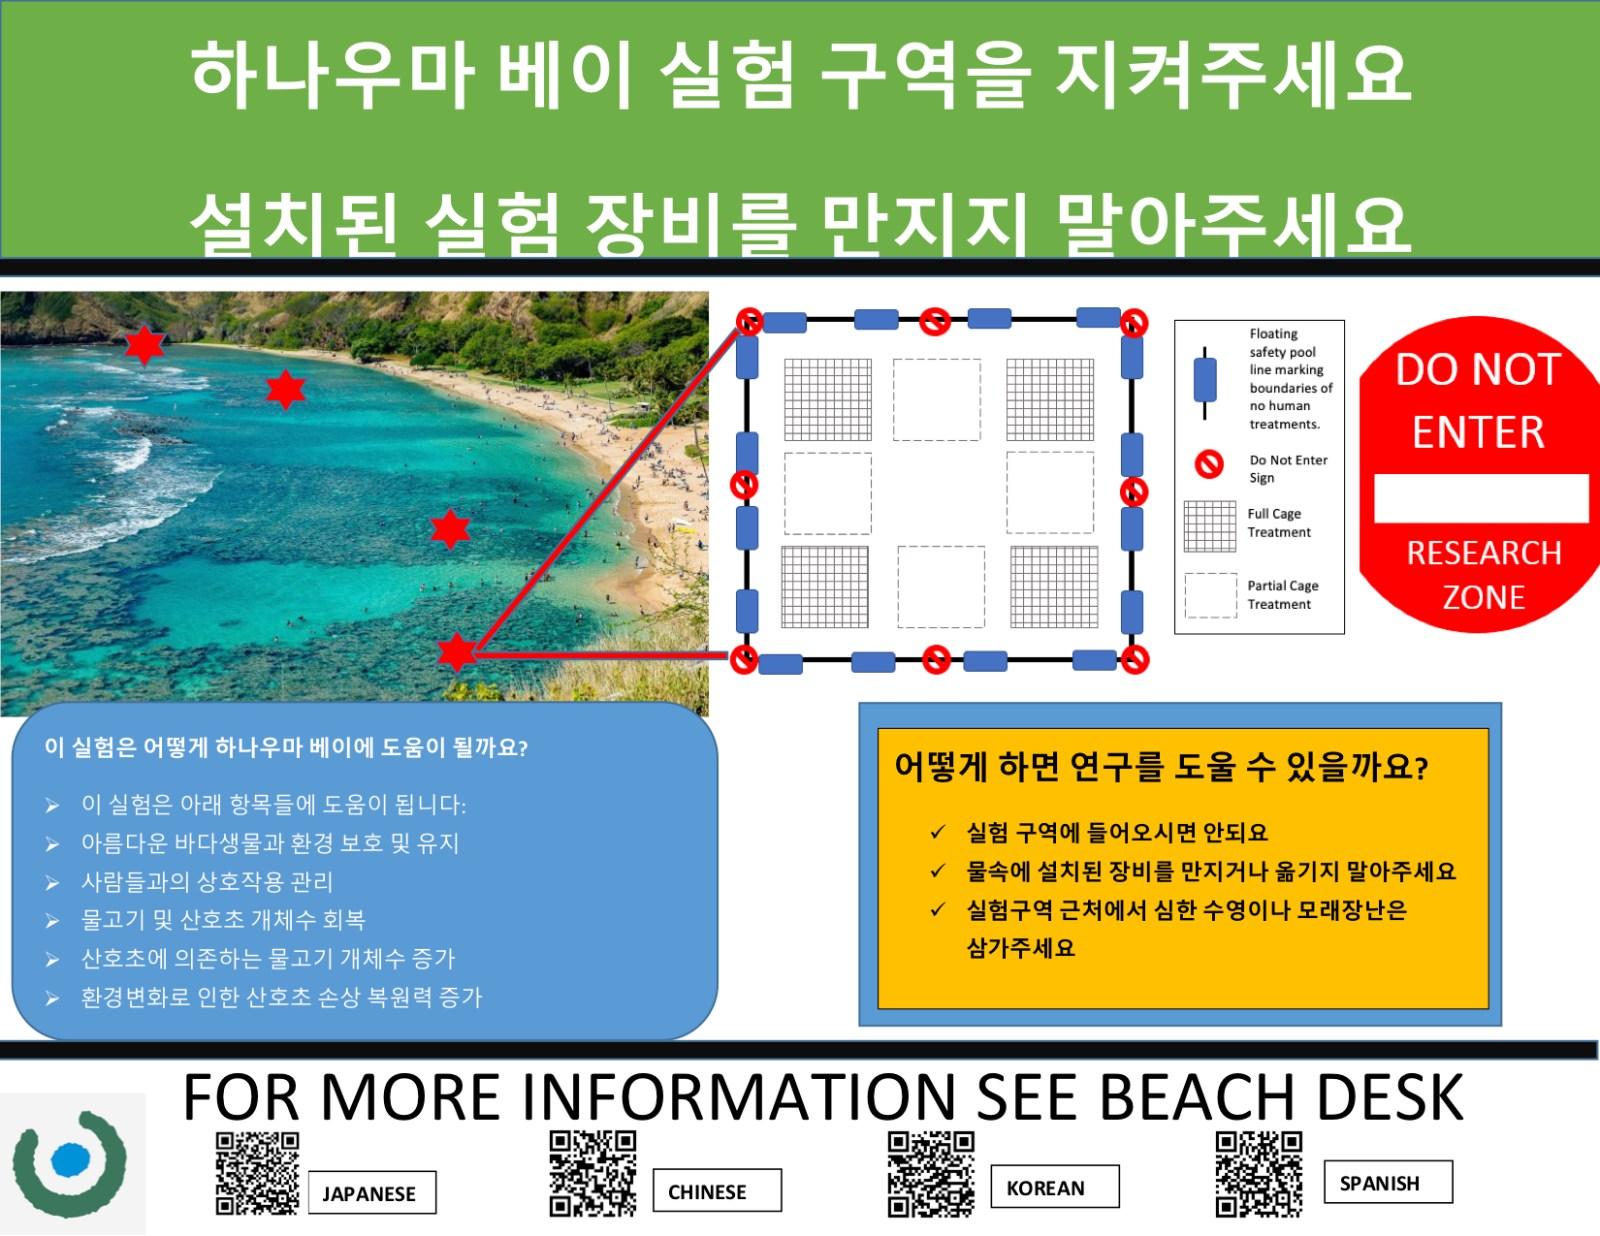 IMPACT STUDY SIGN_Korean.jpg